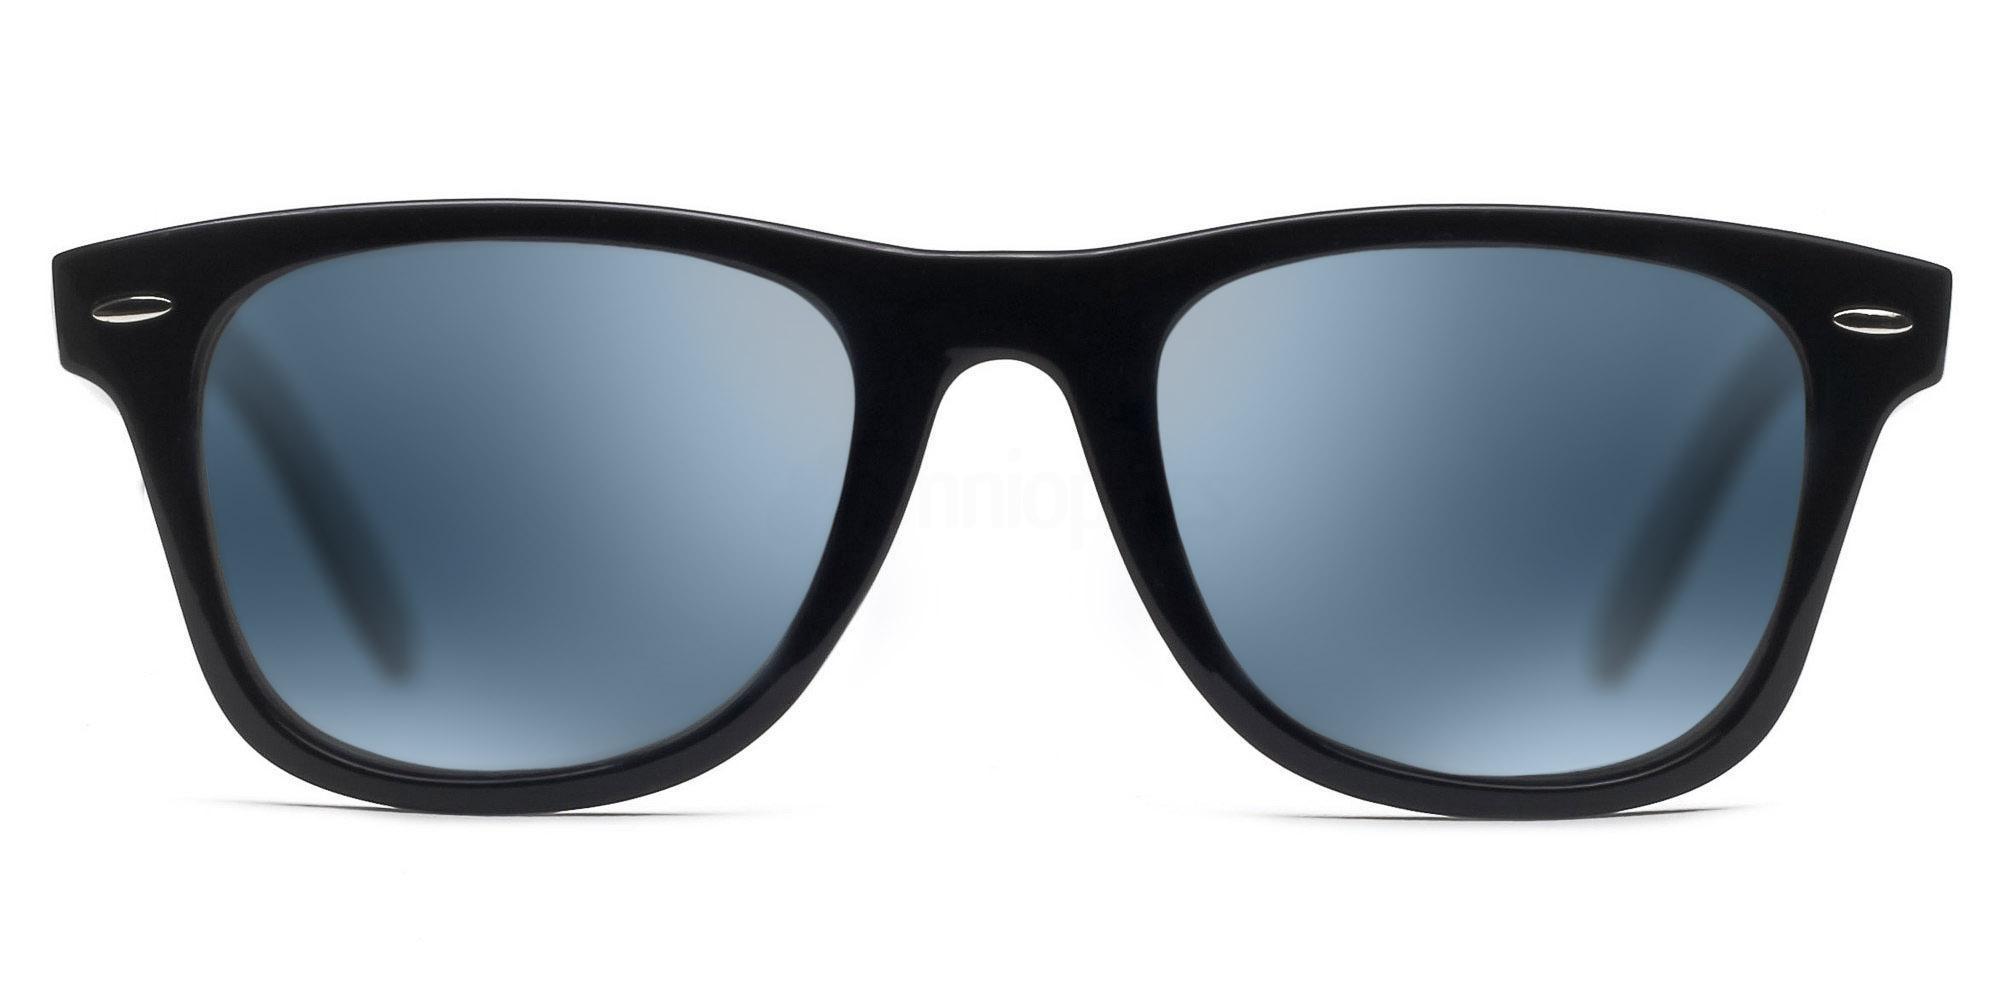 C01 Polarized Grey with Silver Mirror P2429 - Black (Mirrored Polarized) Sunglasses, Savannah